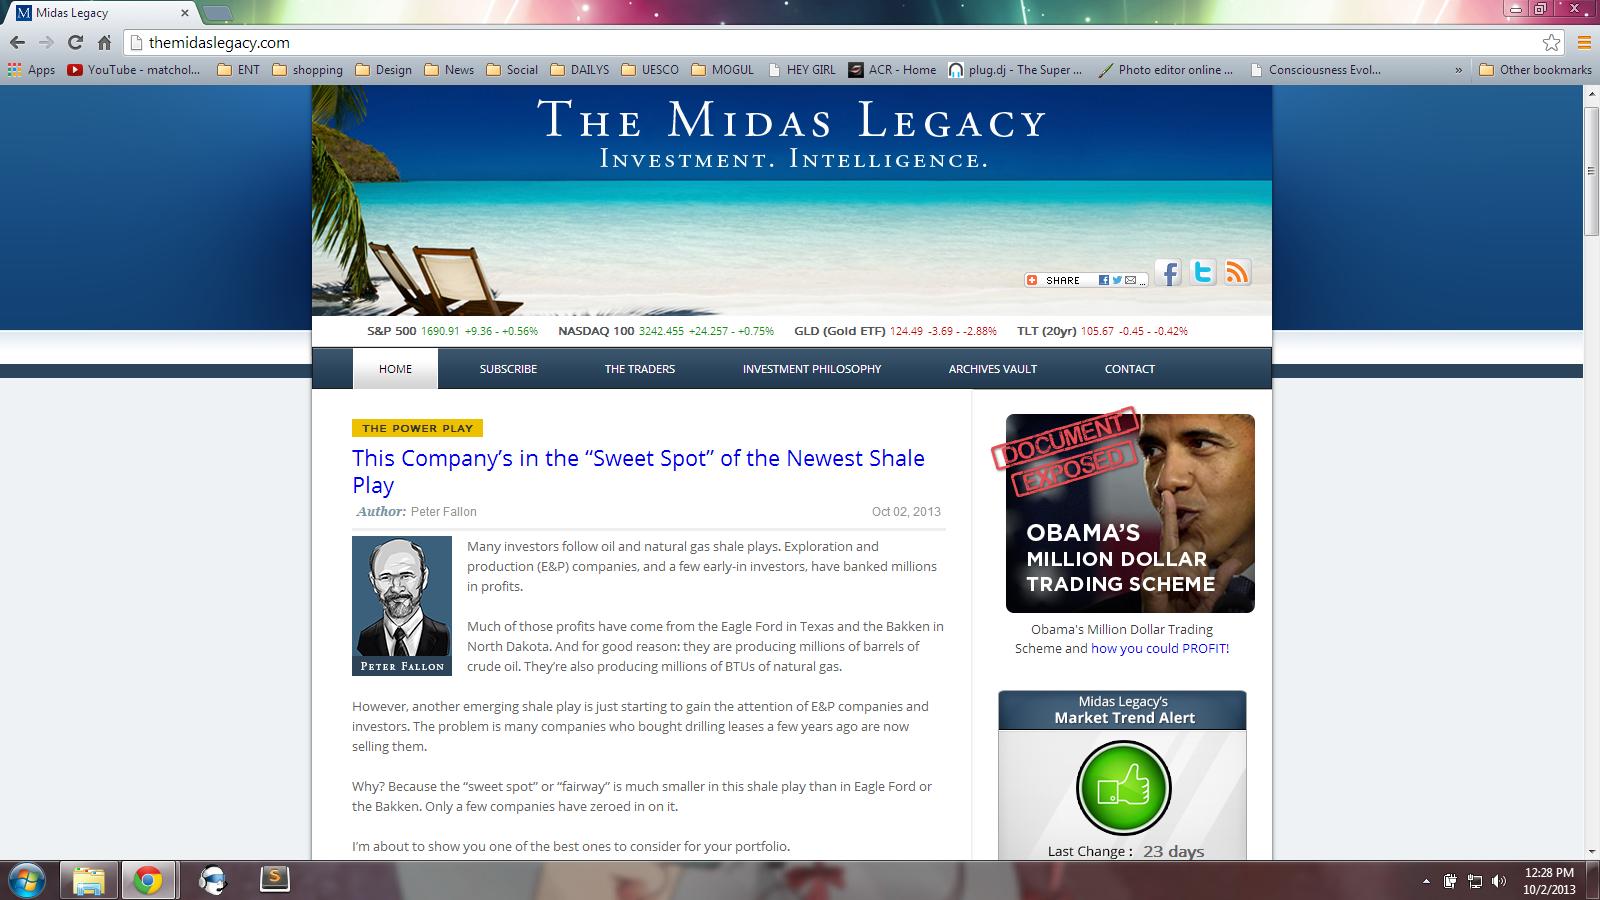 TheMidasLegacy